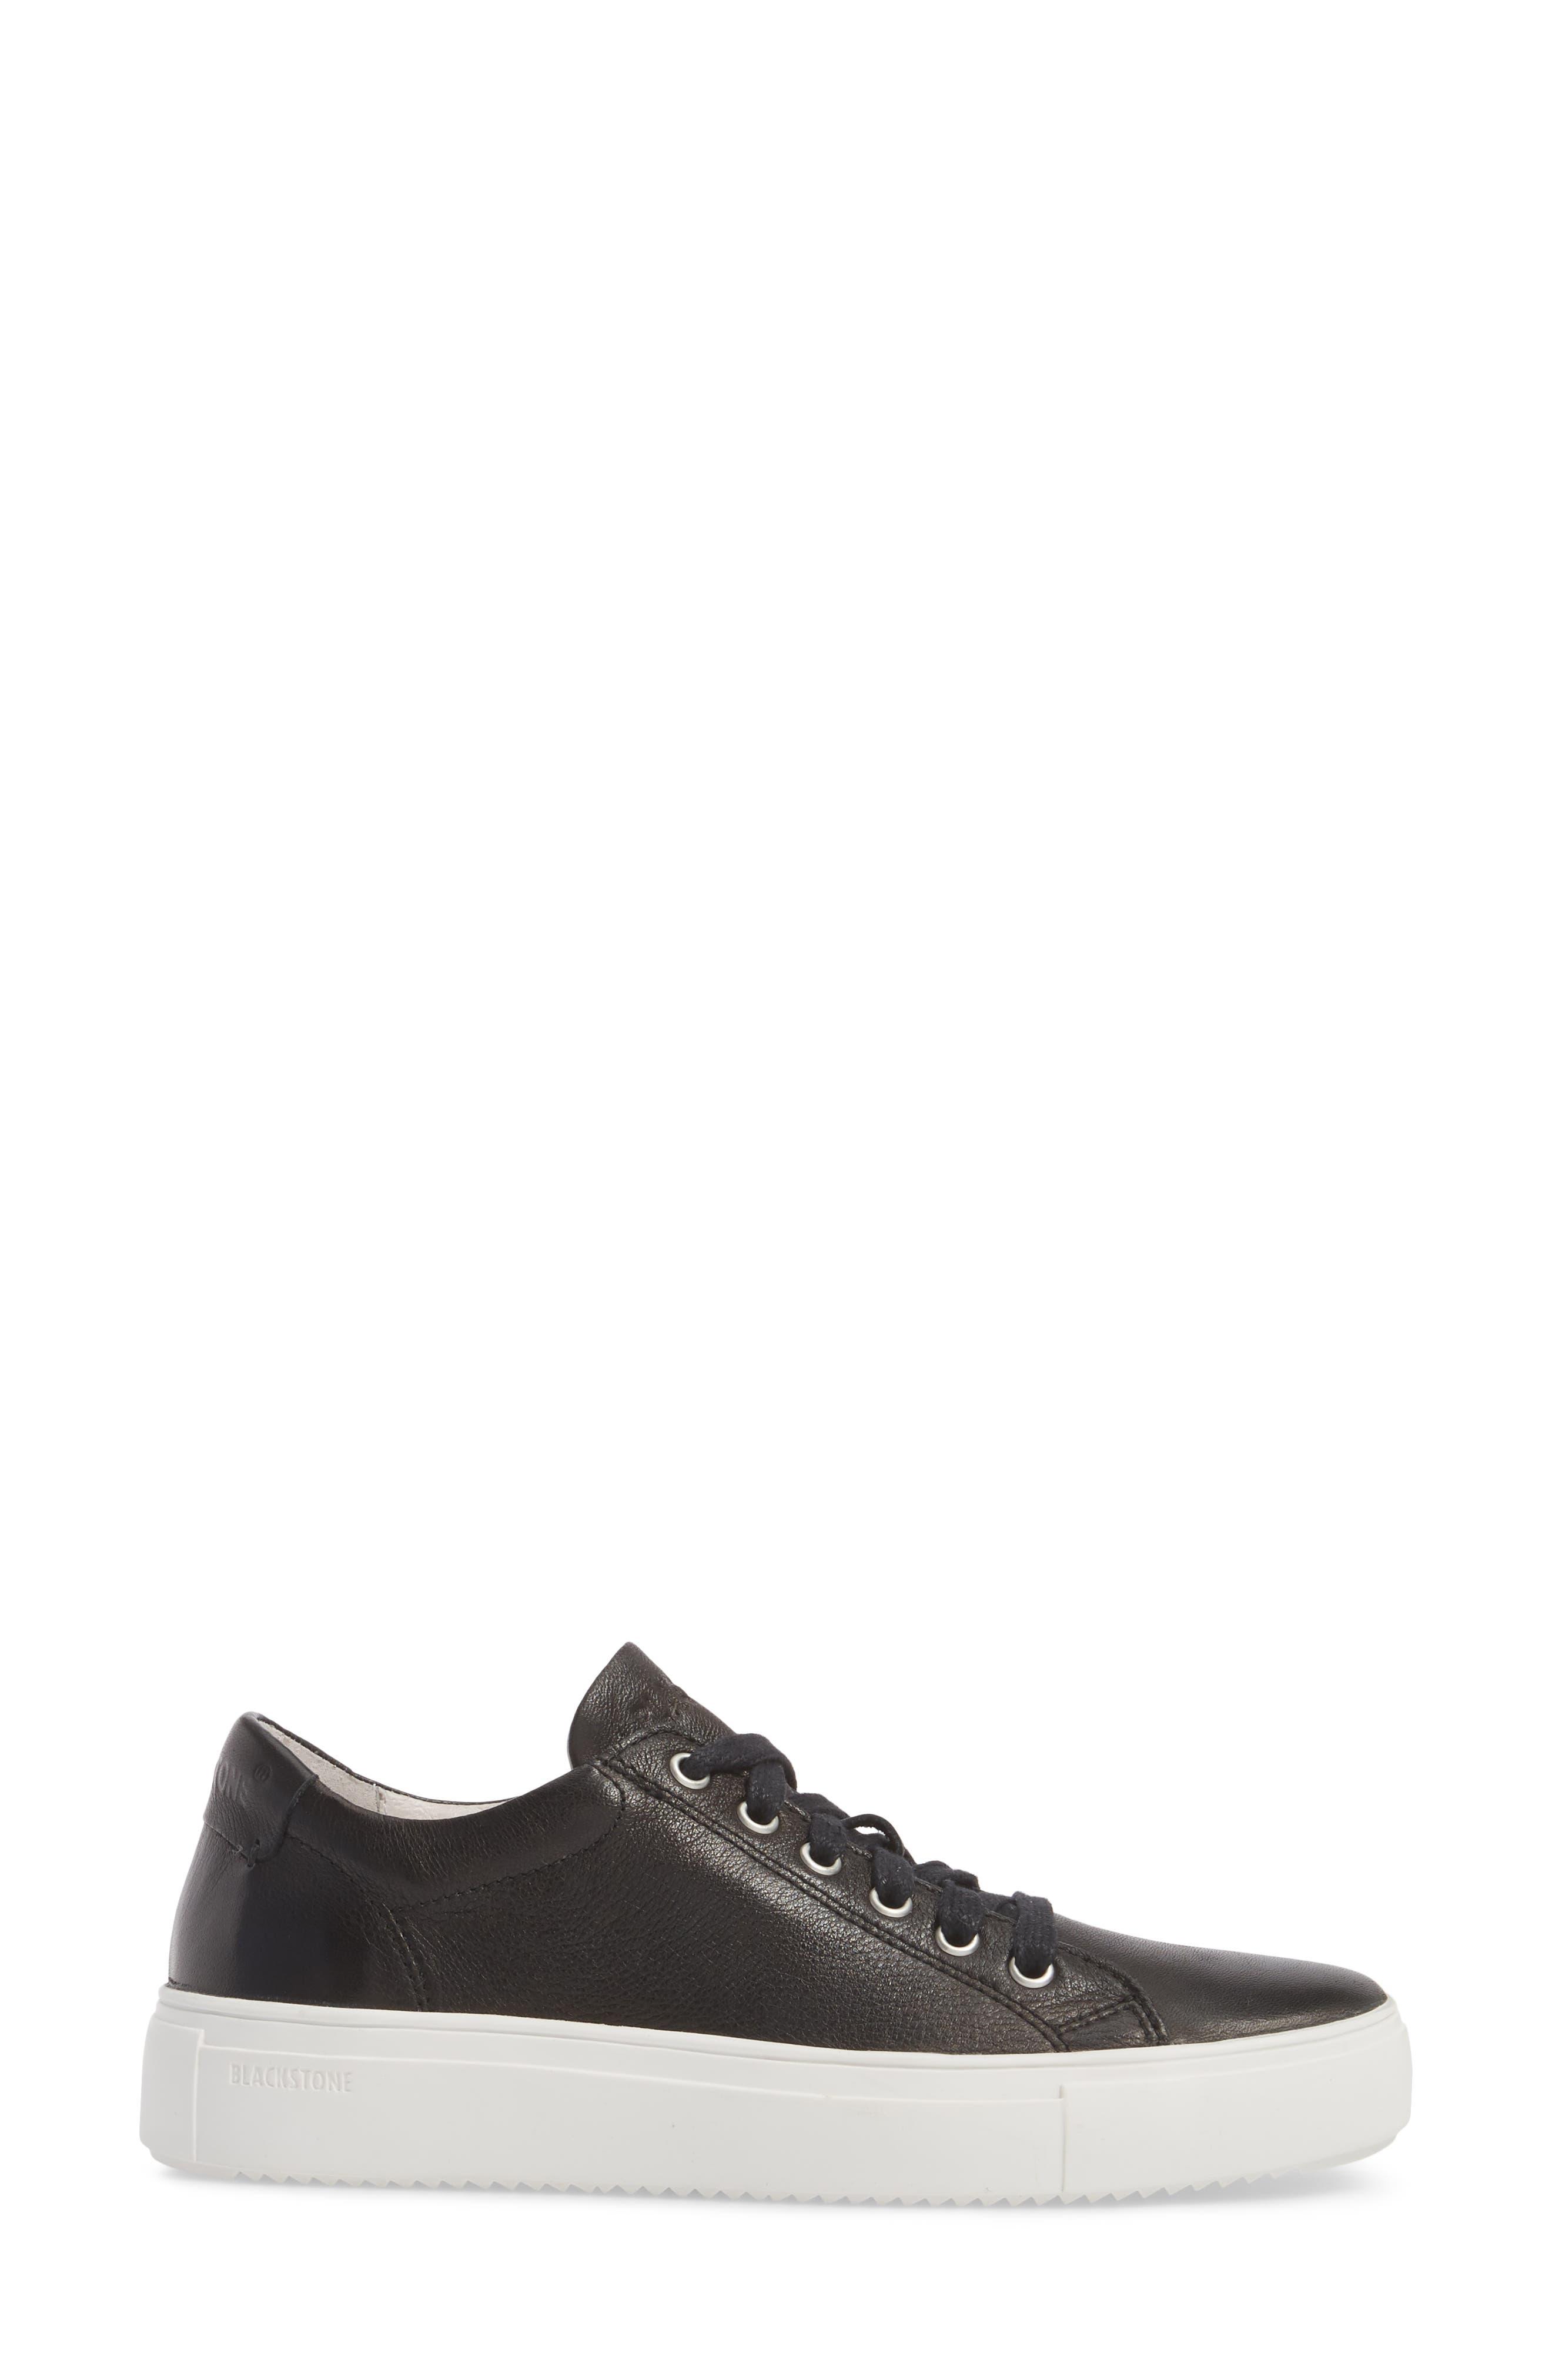 PL71 Low Top Sneaker,                             Alternate thumbnail 3, color,                             BLACK LEATHER